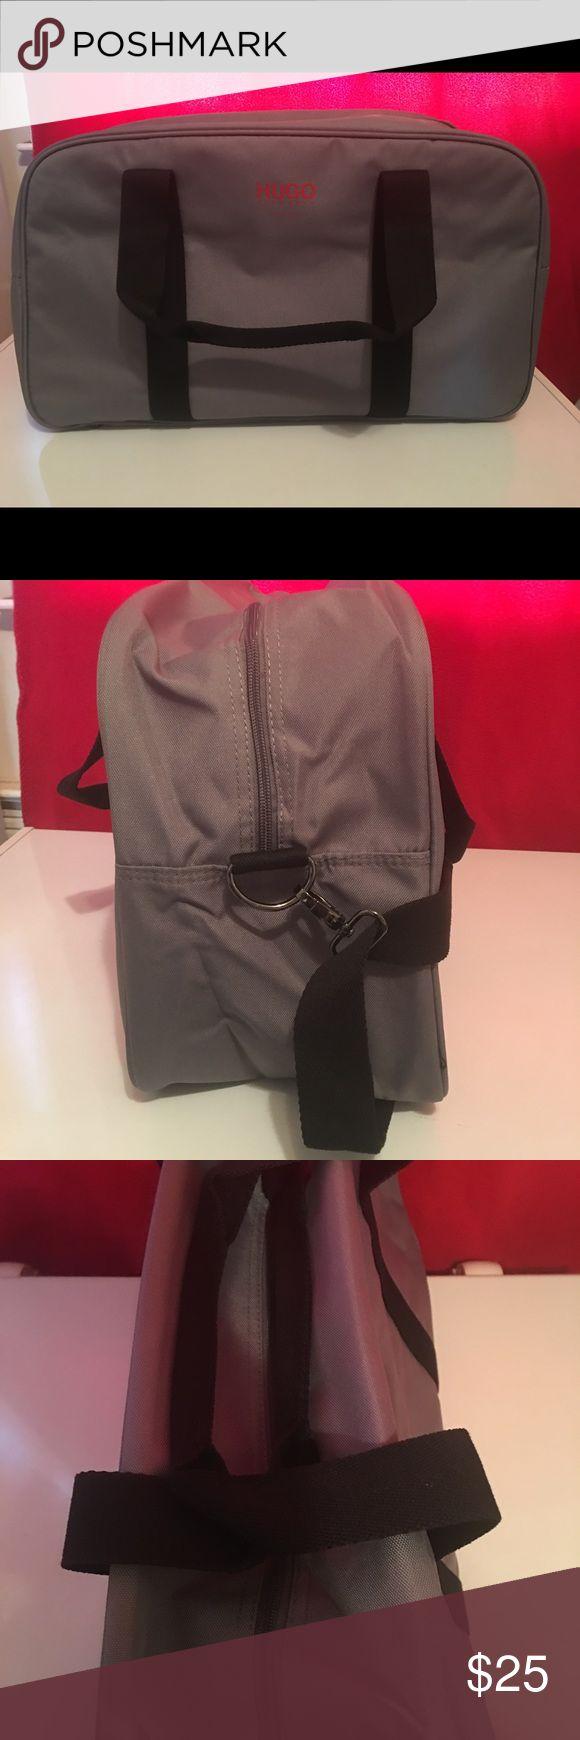 Hugo travel bag Hugo Boss perfume travel bag HUGO Bags Travel Bags